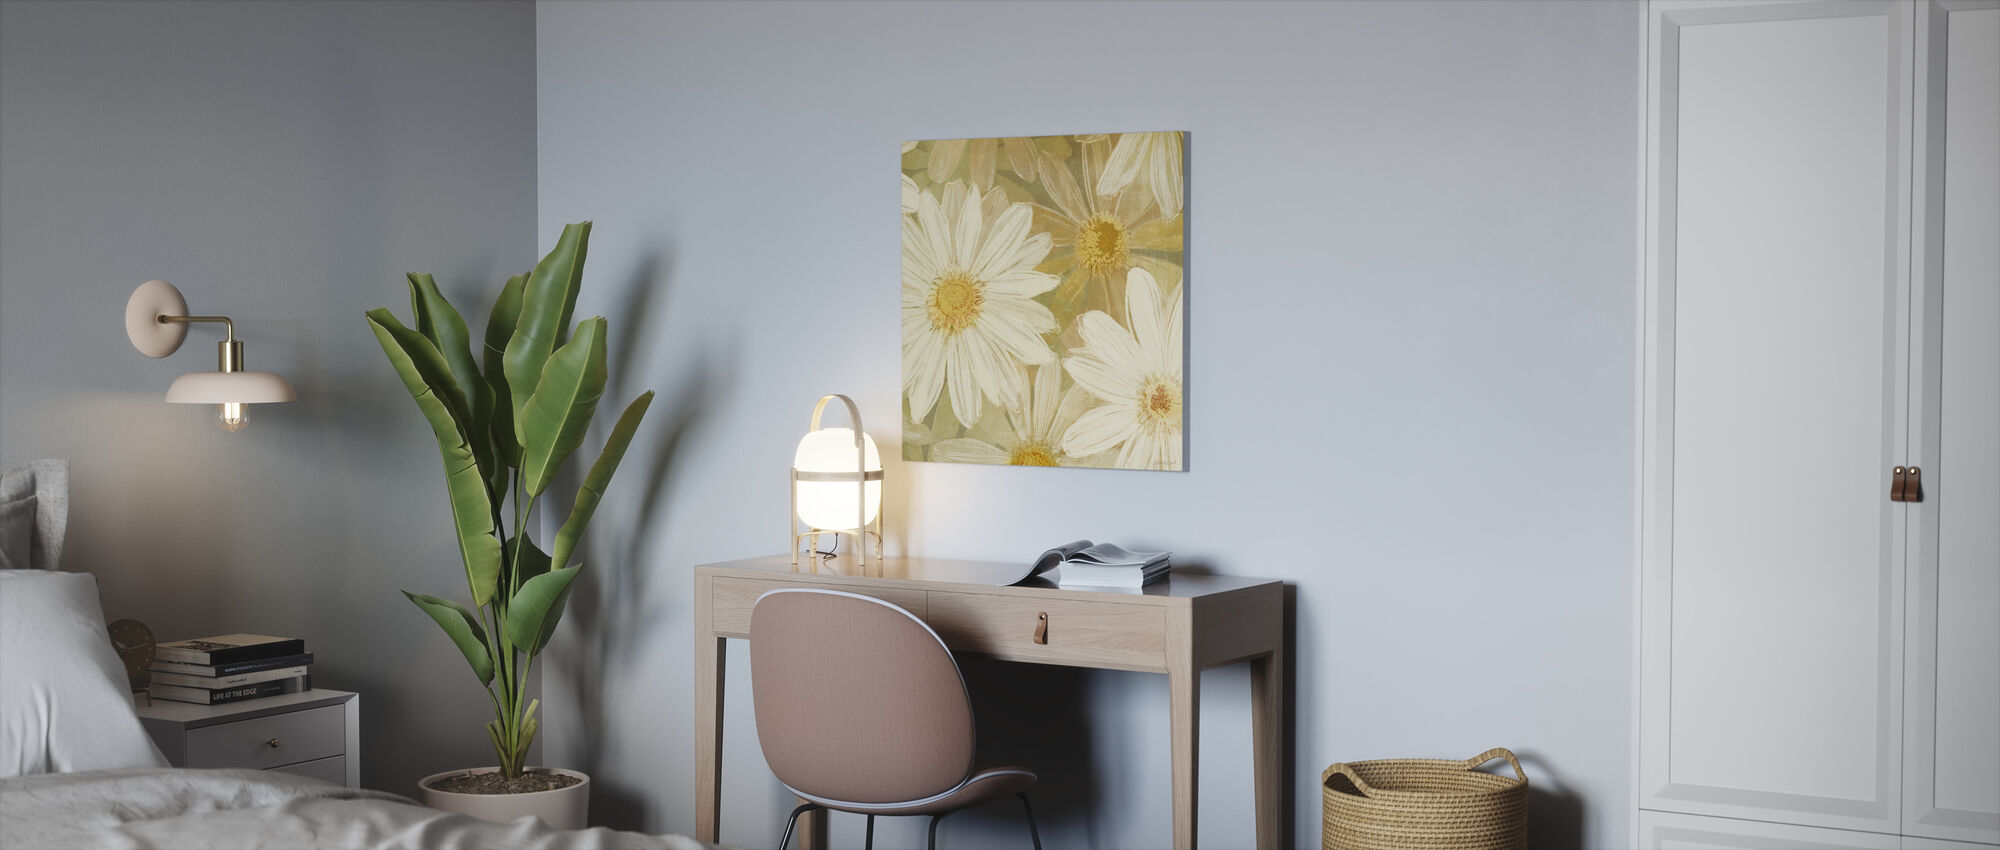 Daisy Story Square II - Canvas print - Kantoor